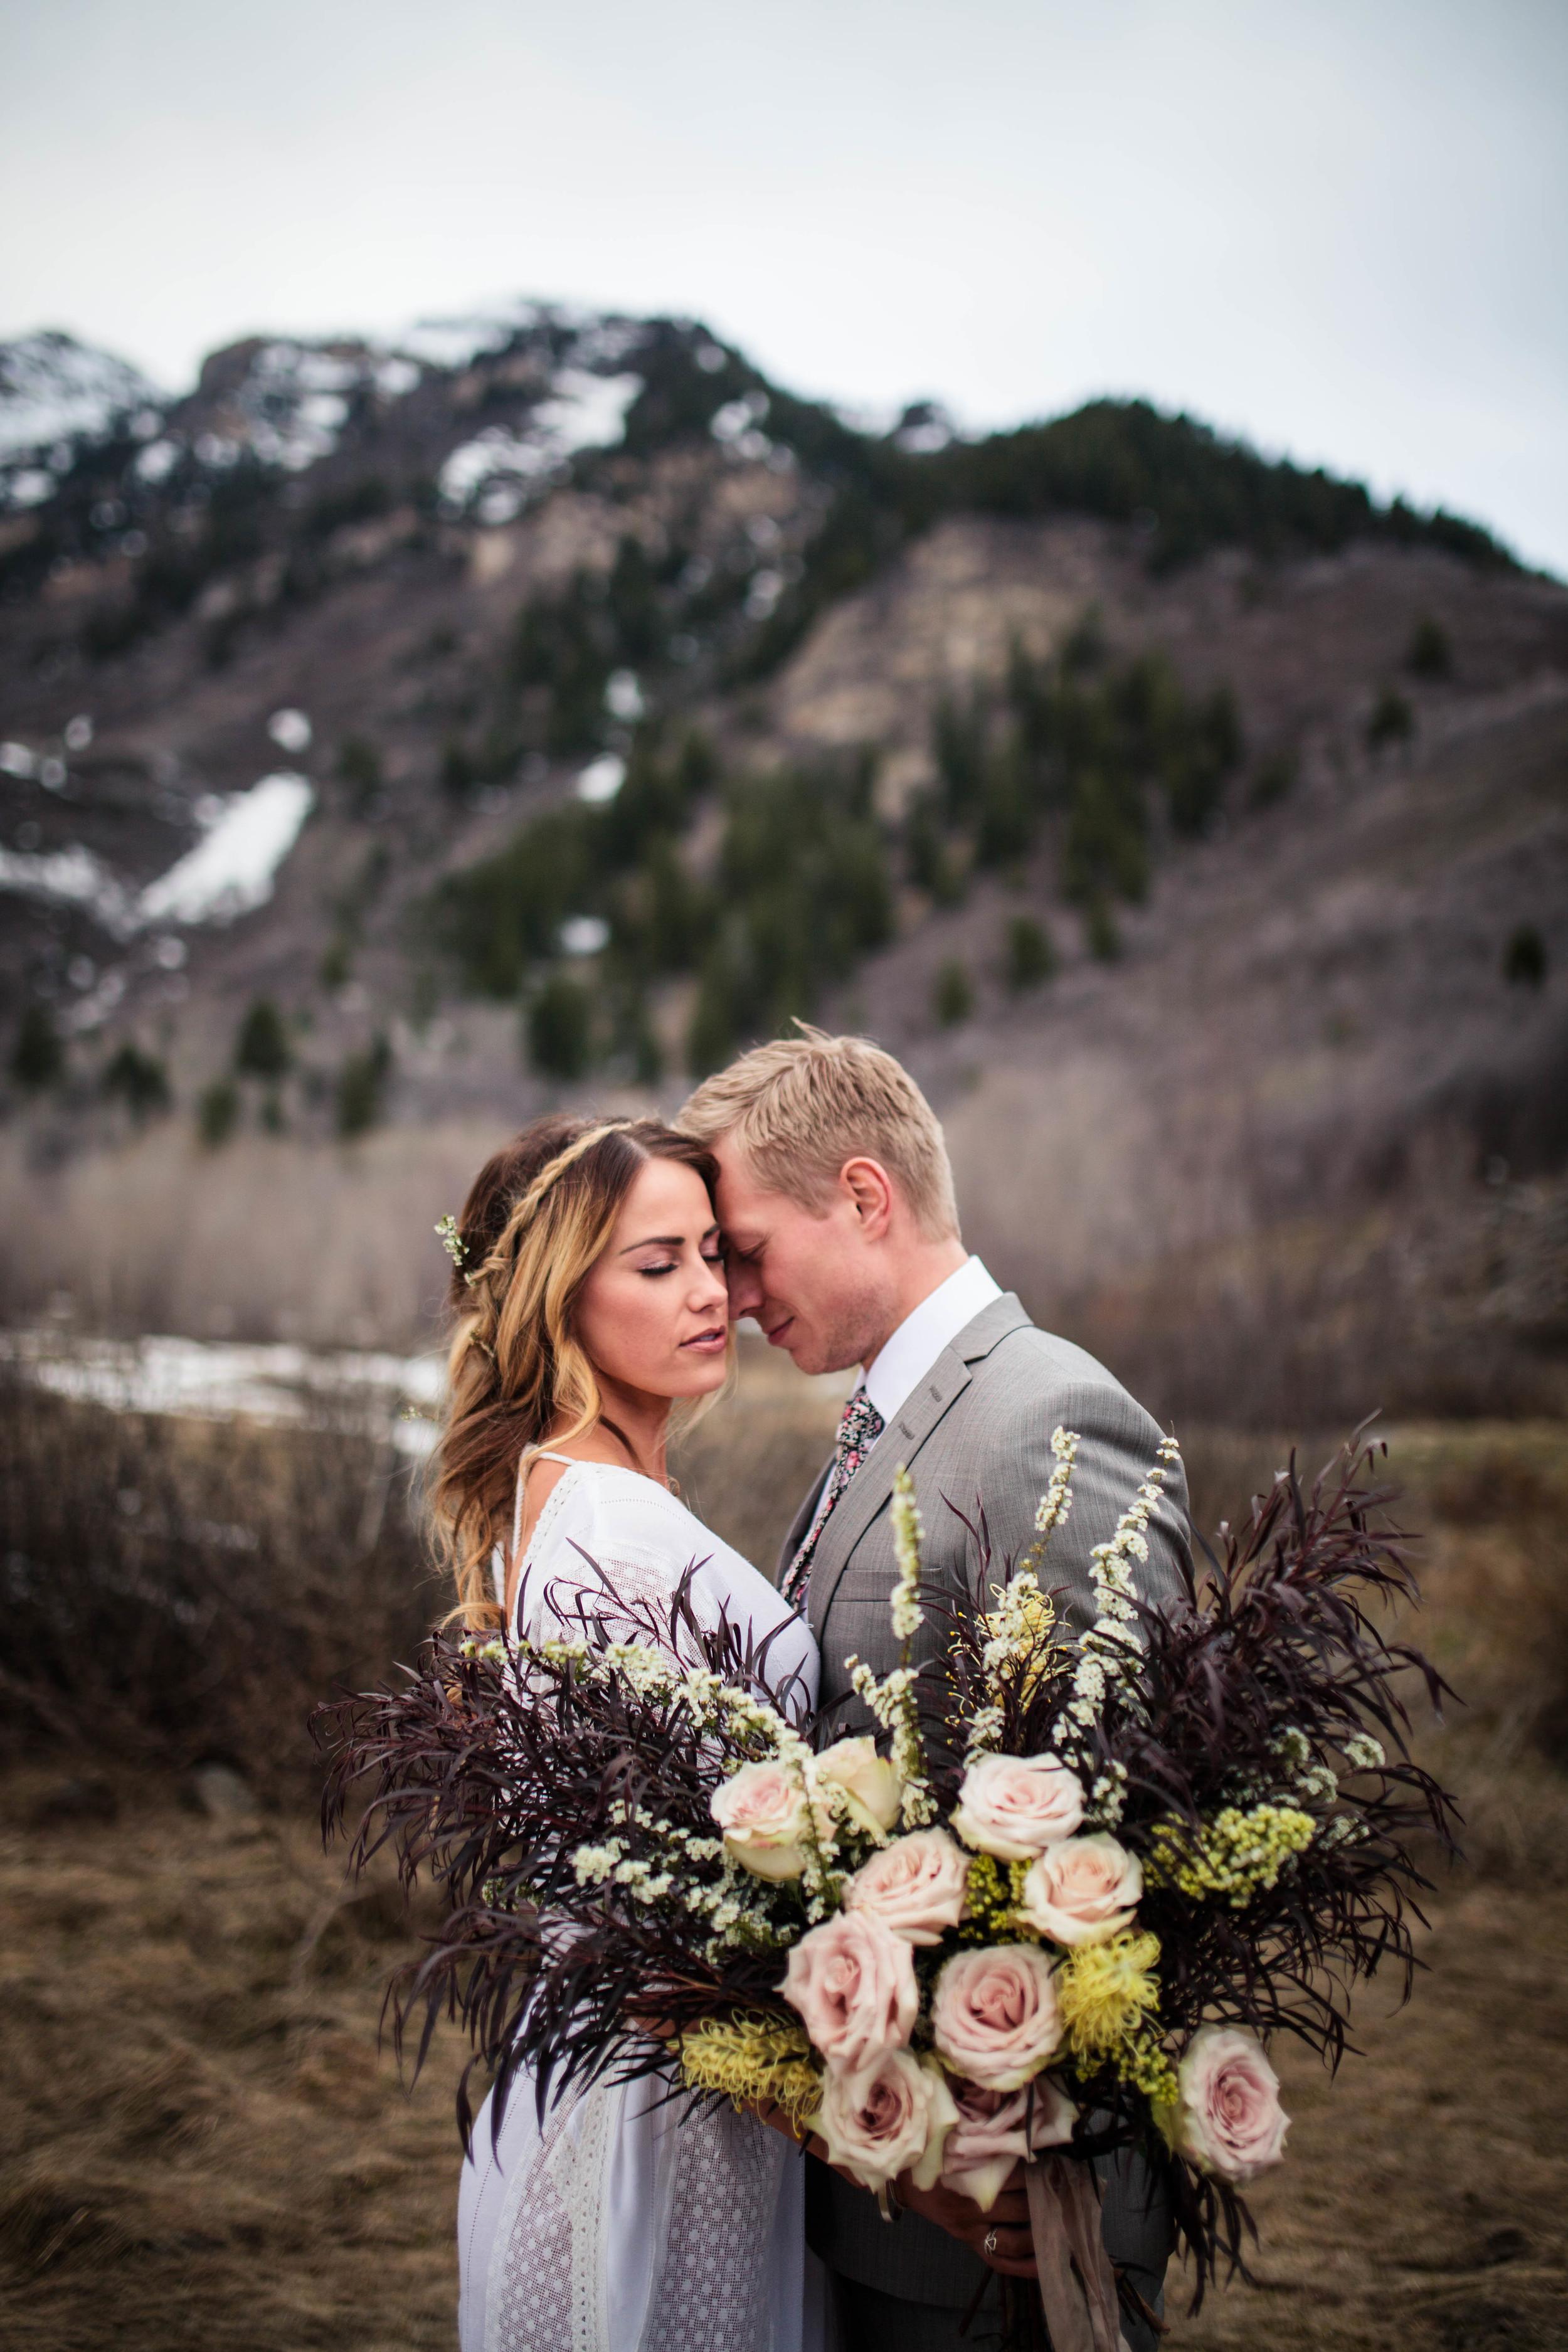 Candace & Thomas - Stylized Elopement - Whitney Justesen Photography-22.jpg